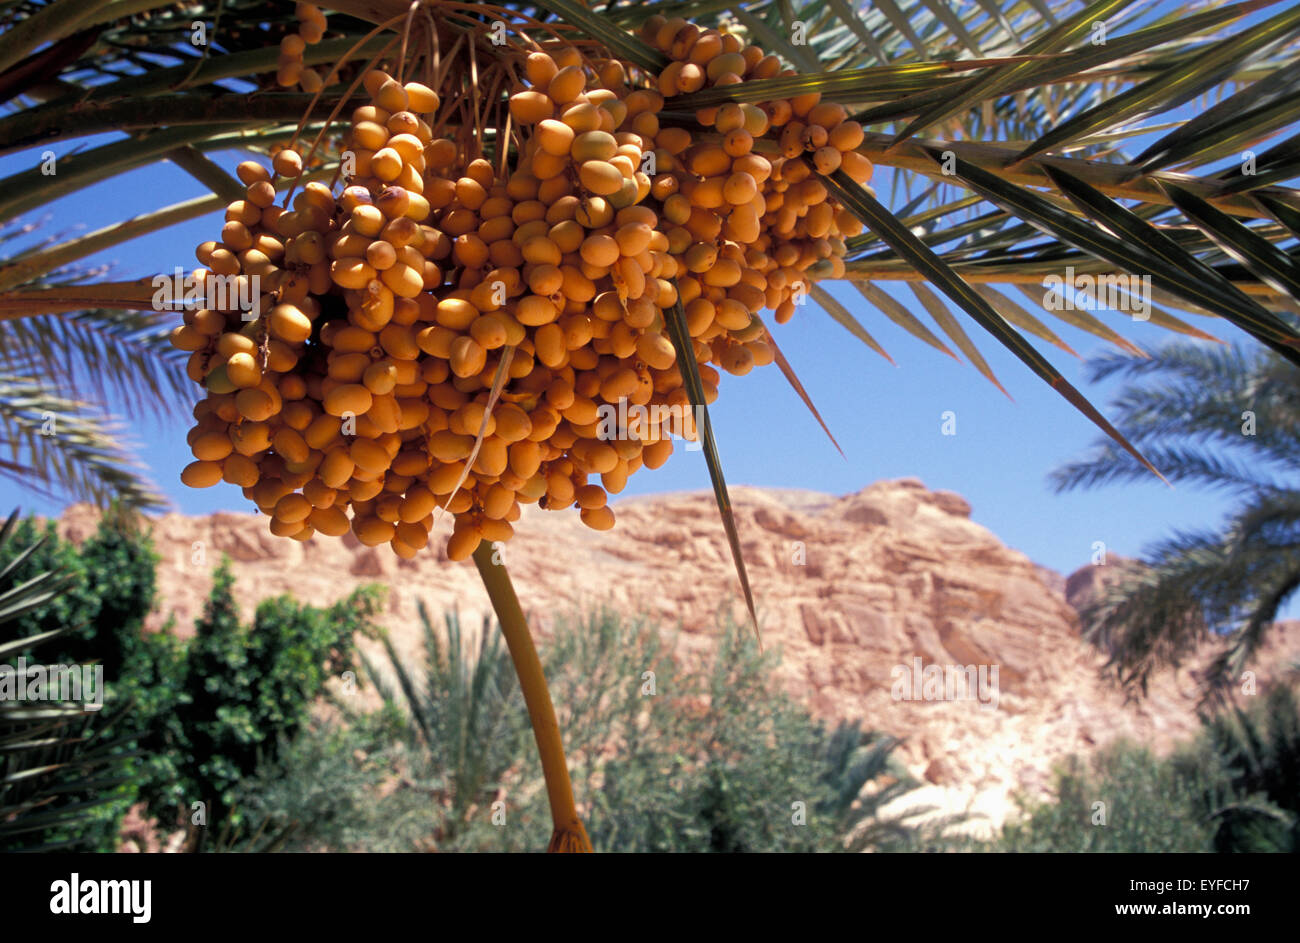 Egypt, Near Nuweiba; Sinai, Dates Growing At Ain Khudra - Stock Image